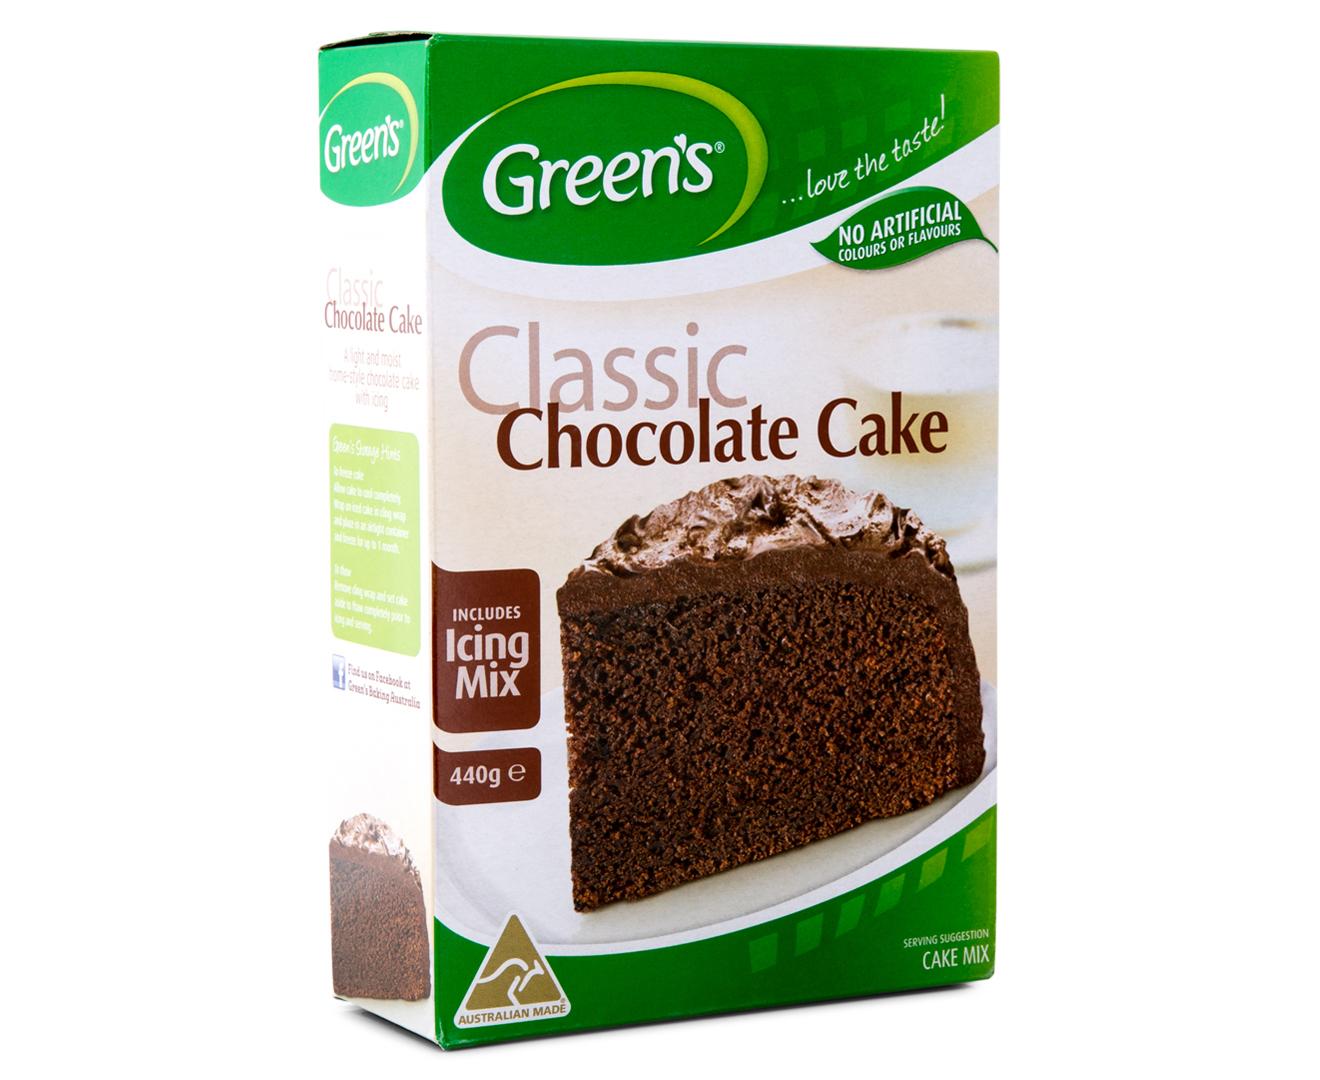 Greens Chocolate Cake Mix